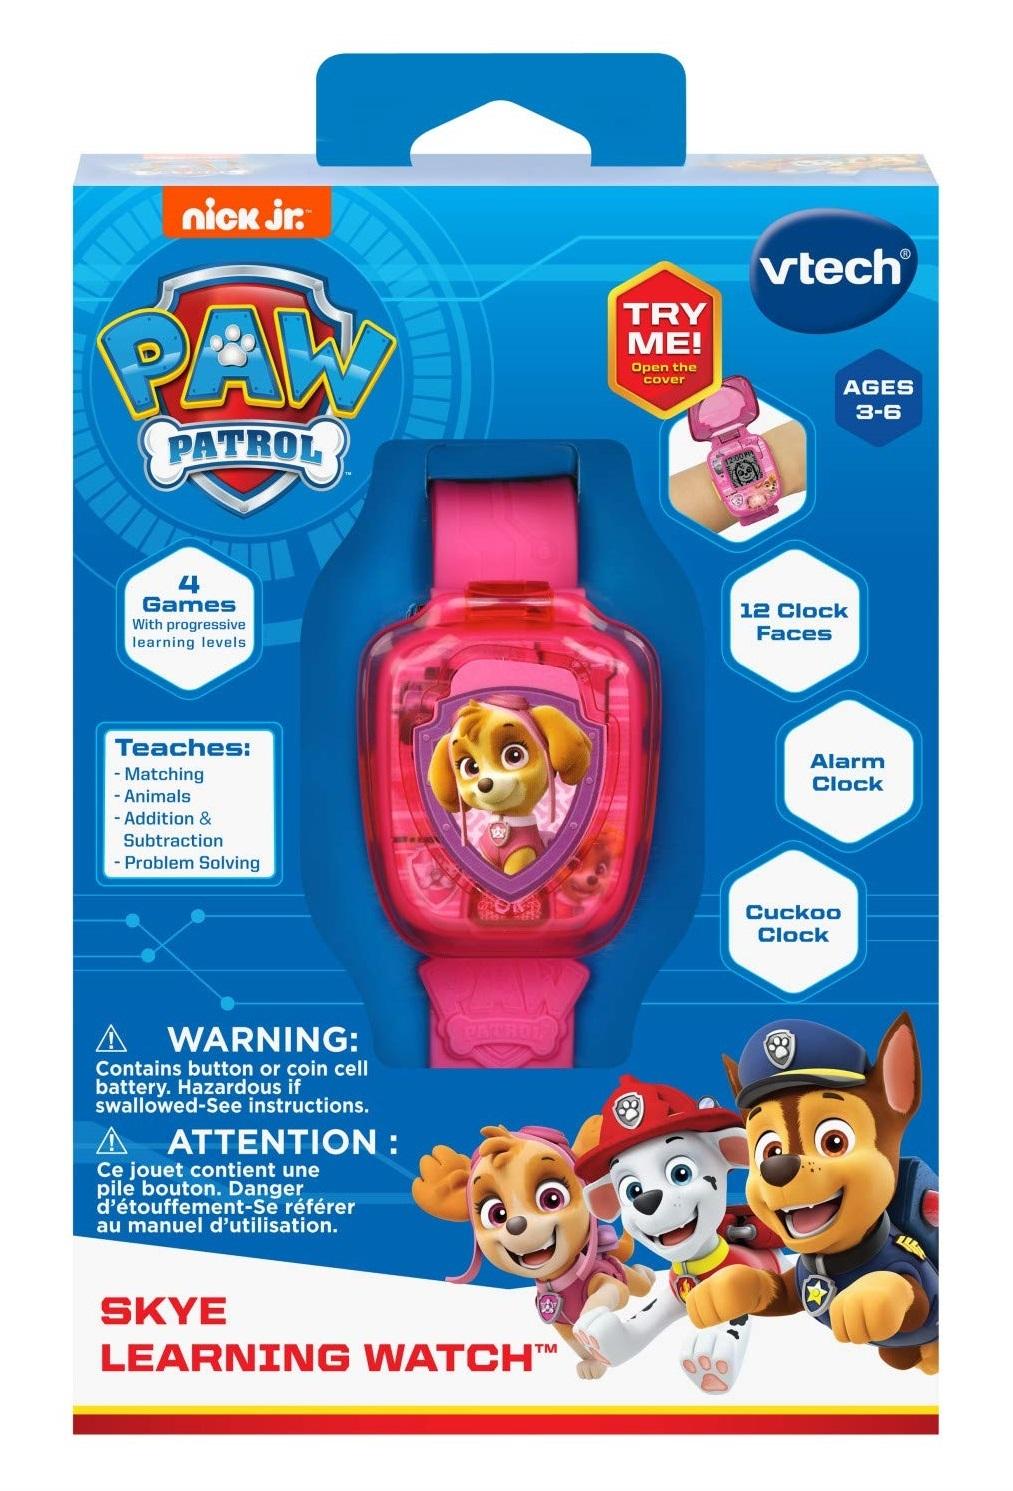 Vtech: Paw Patrol Learning Watch - Skye image